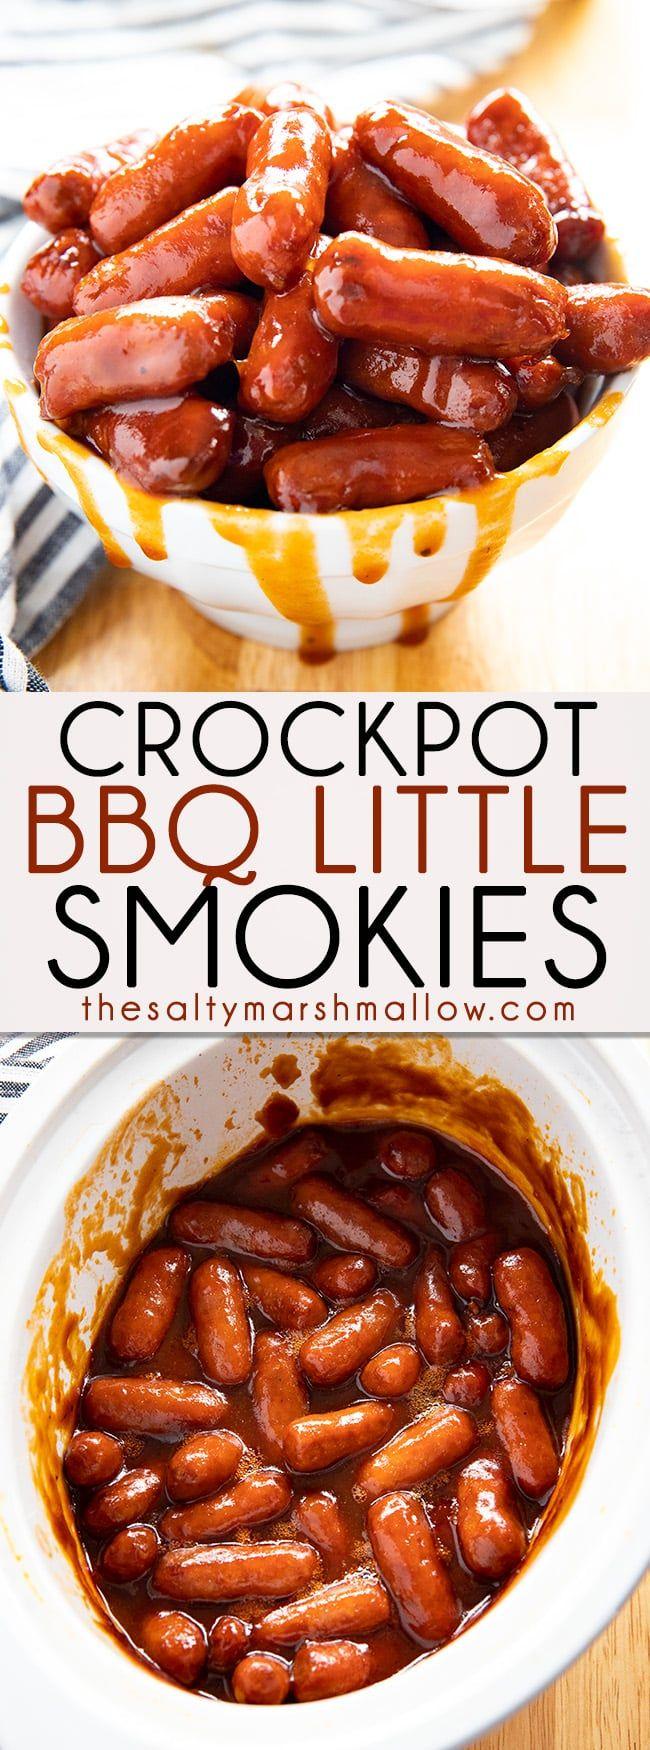 Crockpot BBQ Little Smokies - The Salty Marshmallow